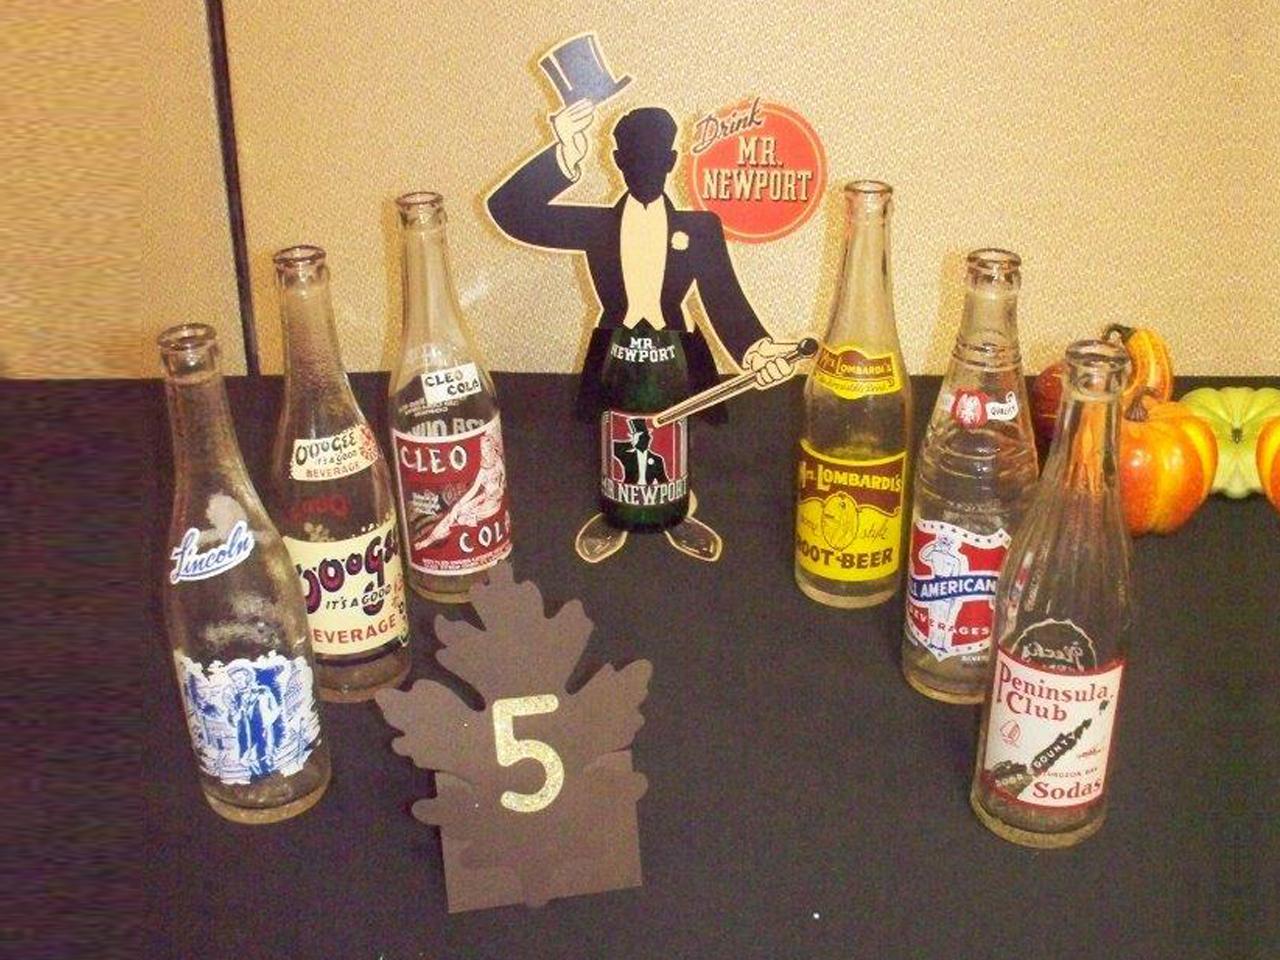 Sampling of ACL sodas